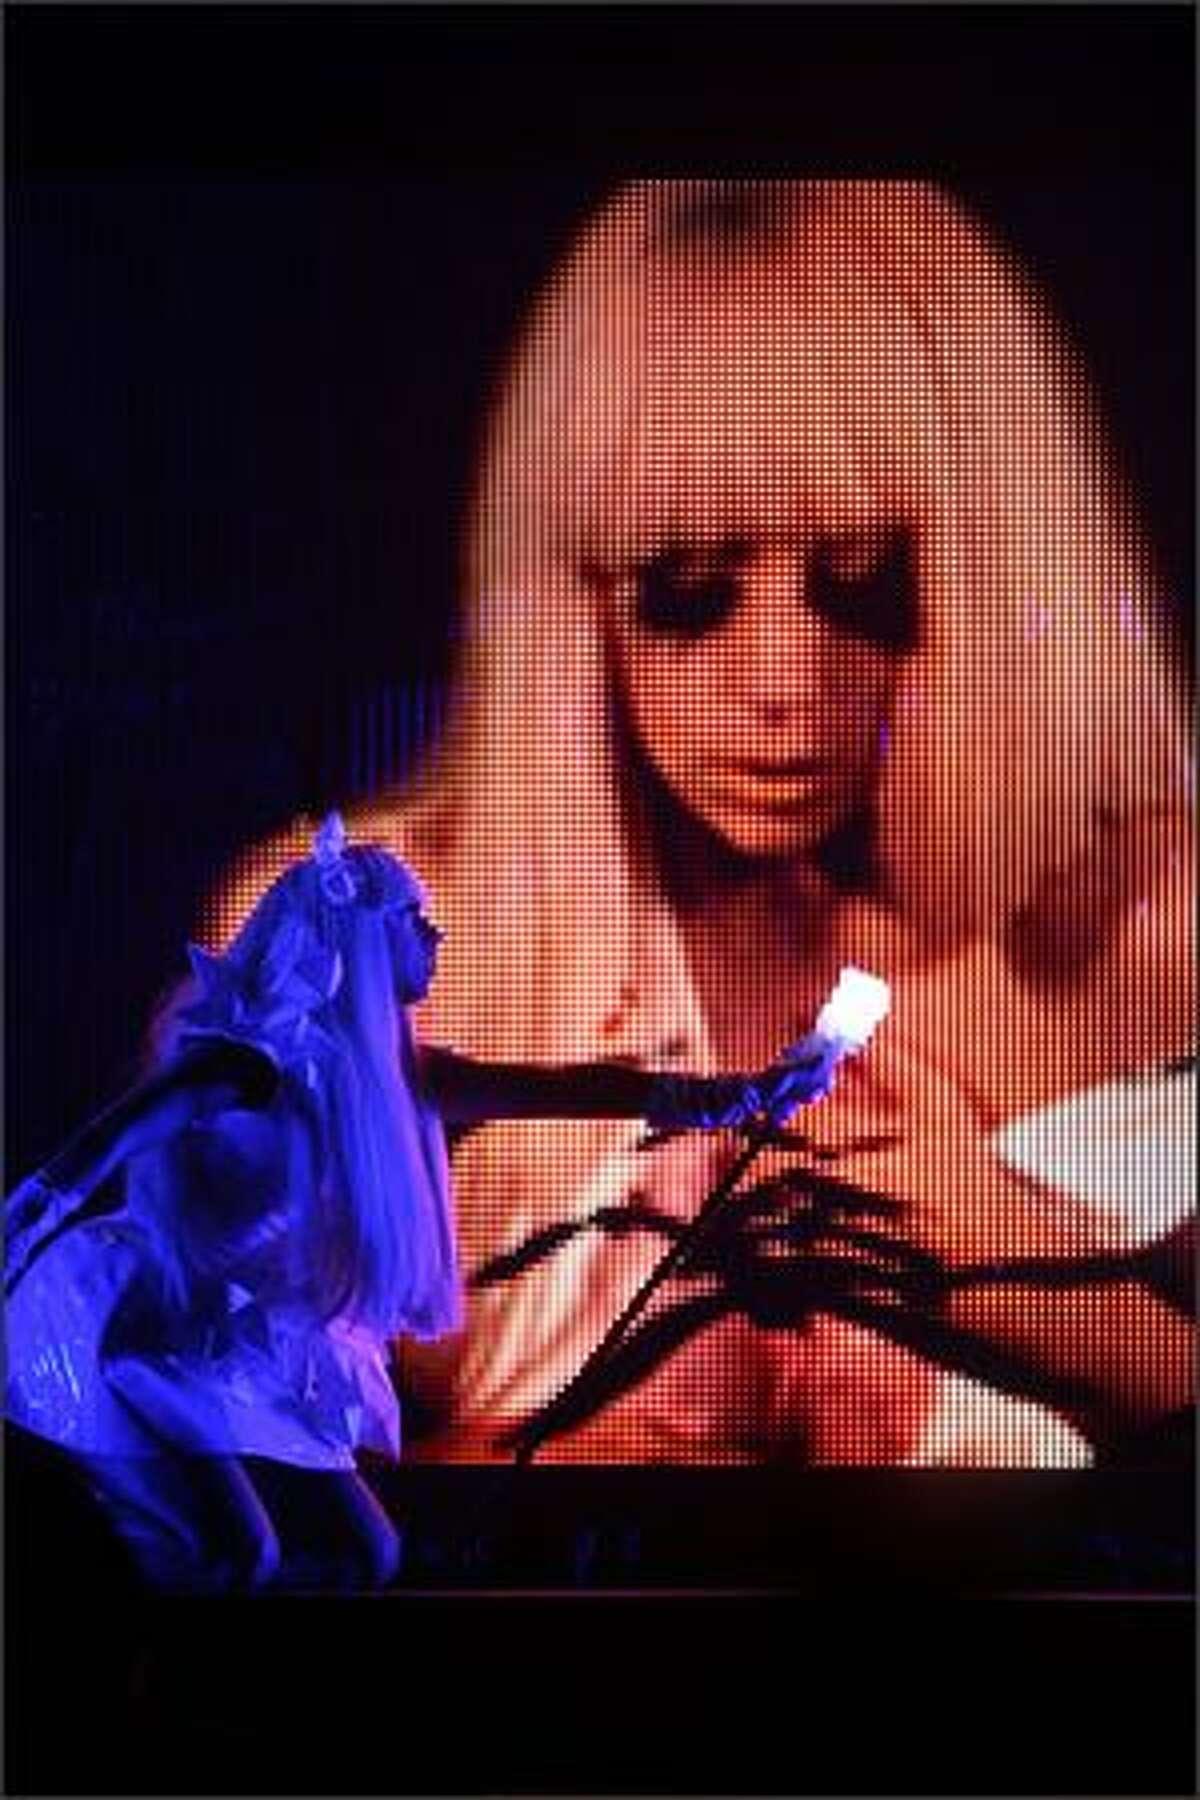 Lady Gaga performs at the Tacoma Dome in Tacoma on Saturday, No. 22, 2008.